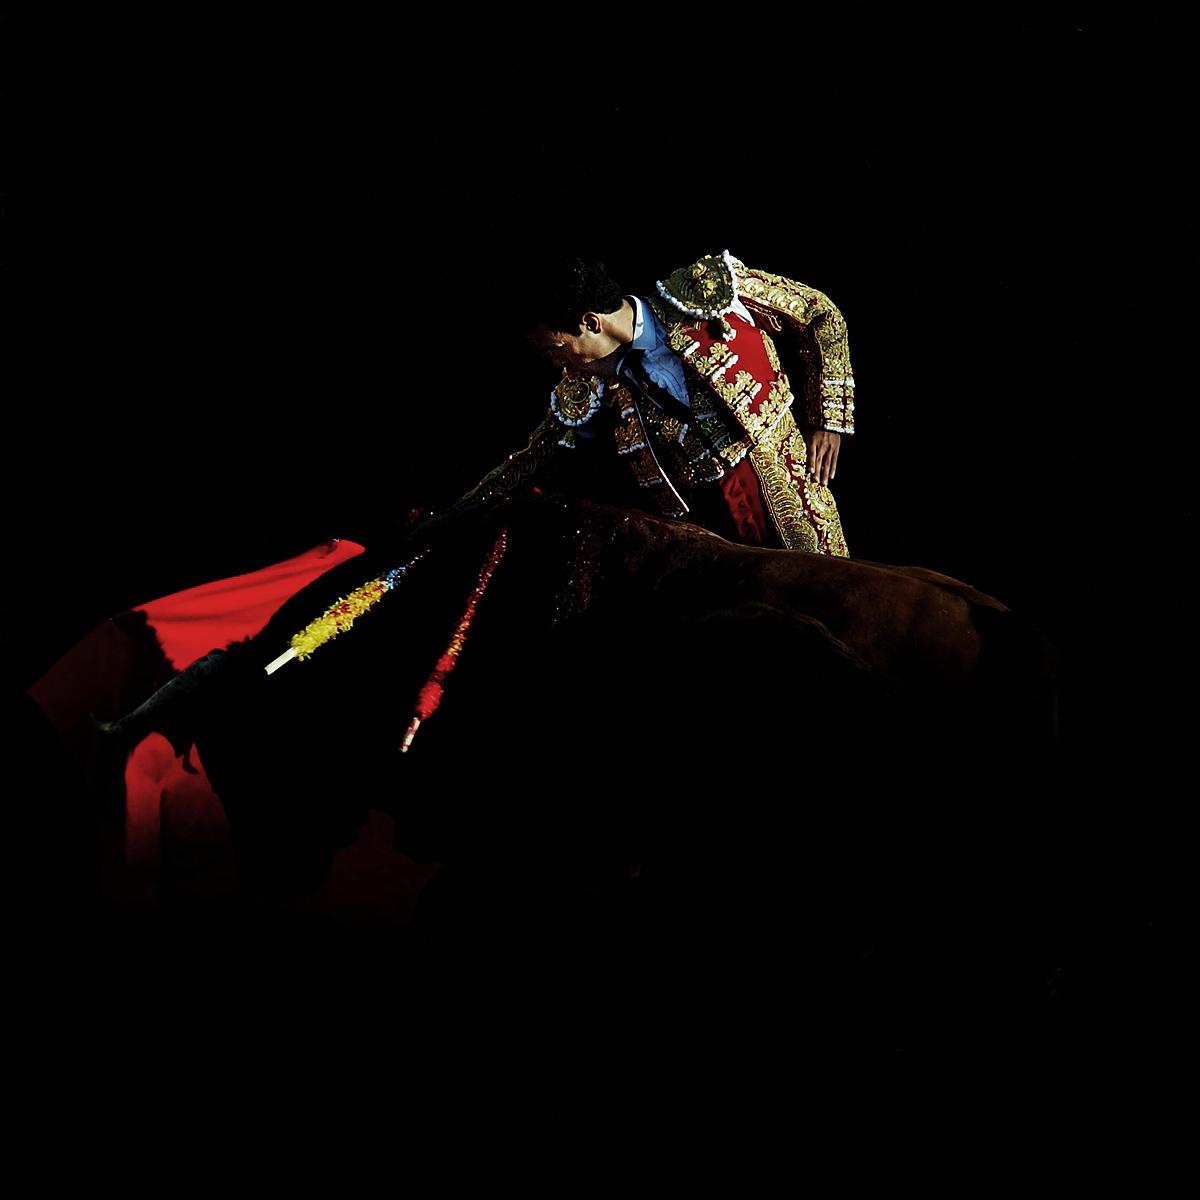 VictorFraile_Portfolio_Stories_Bullfighting_05